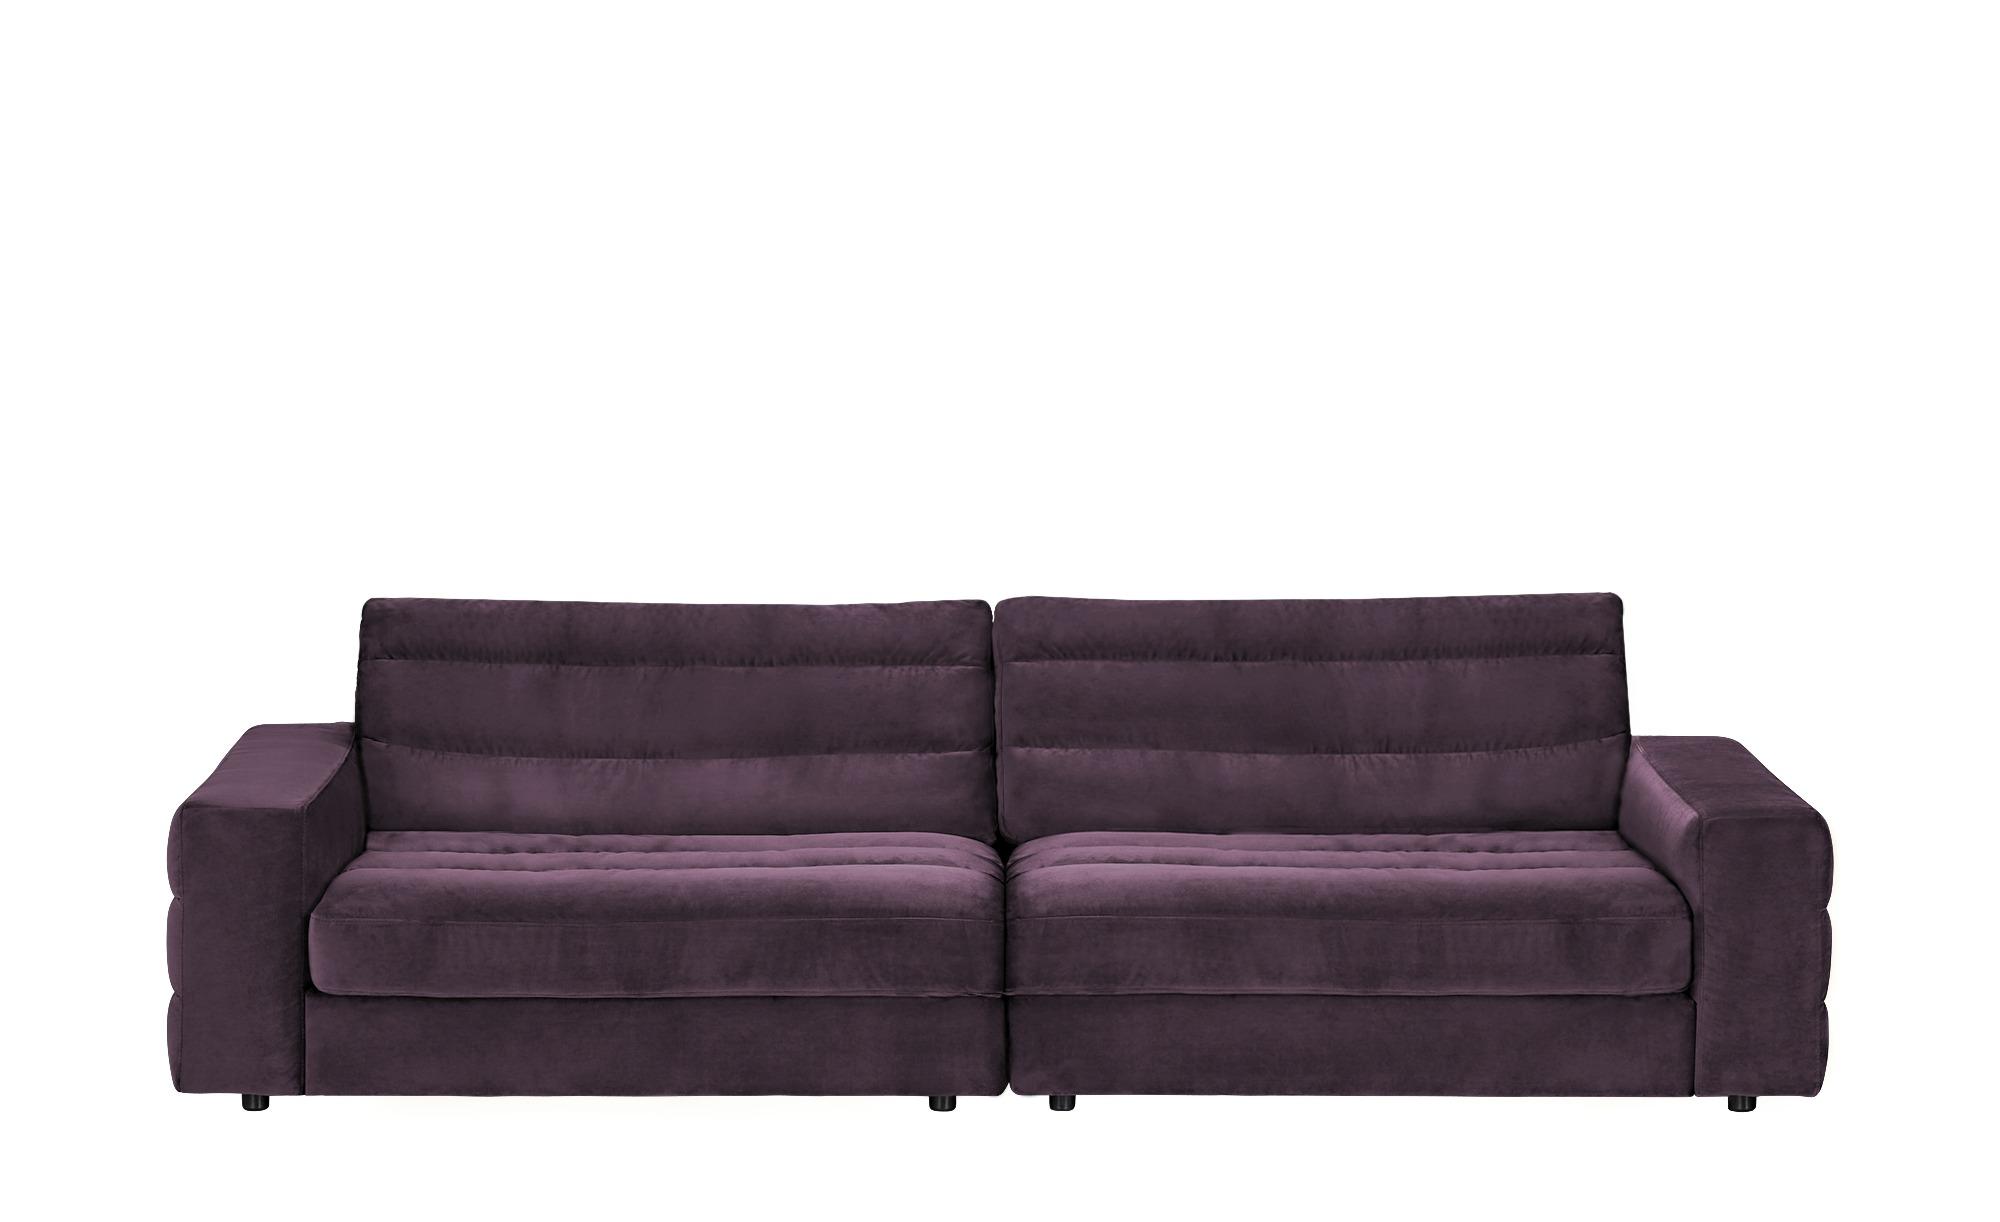 pop Big Sofa  Scarlatti ¦ lila/violett ¦ Maße (cm): B: 296 H: 83 T: 125 Polstermöbel > Sofas > Big-Sofas - Höffner